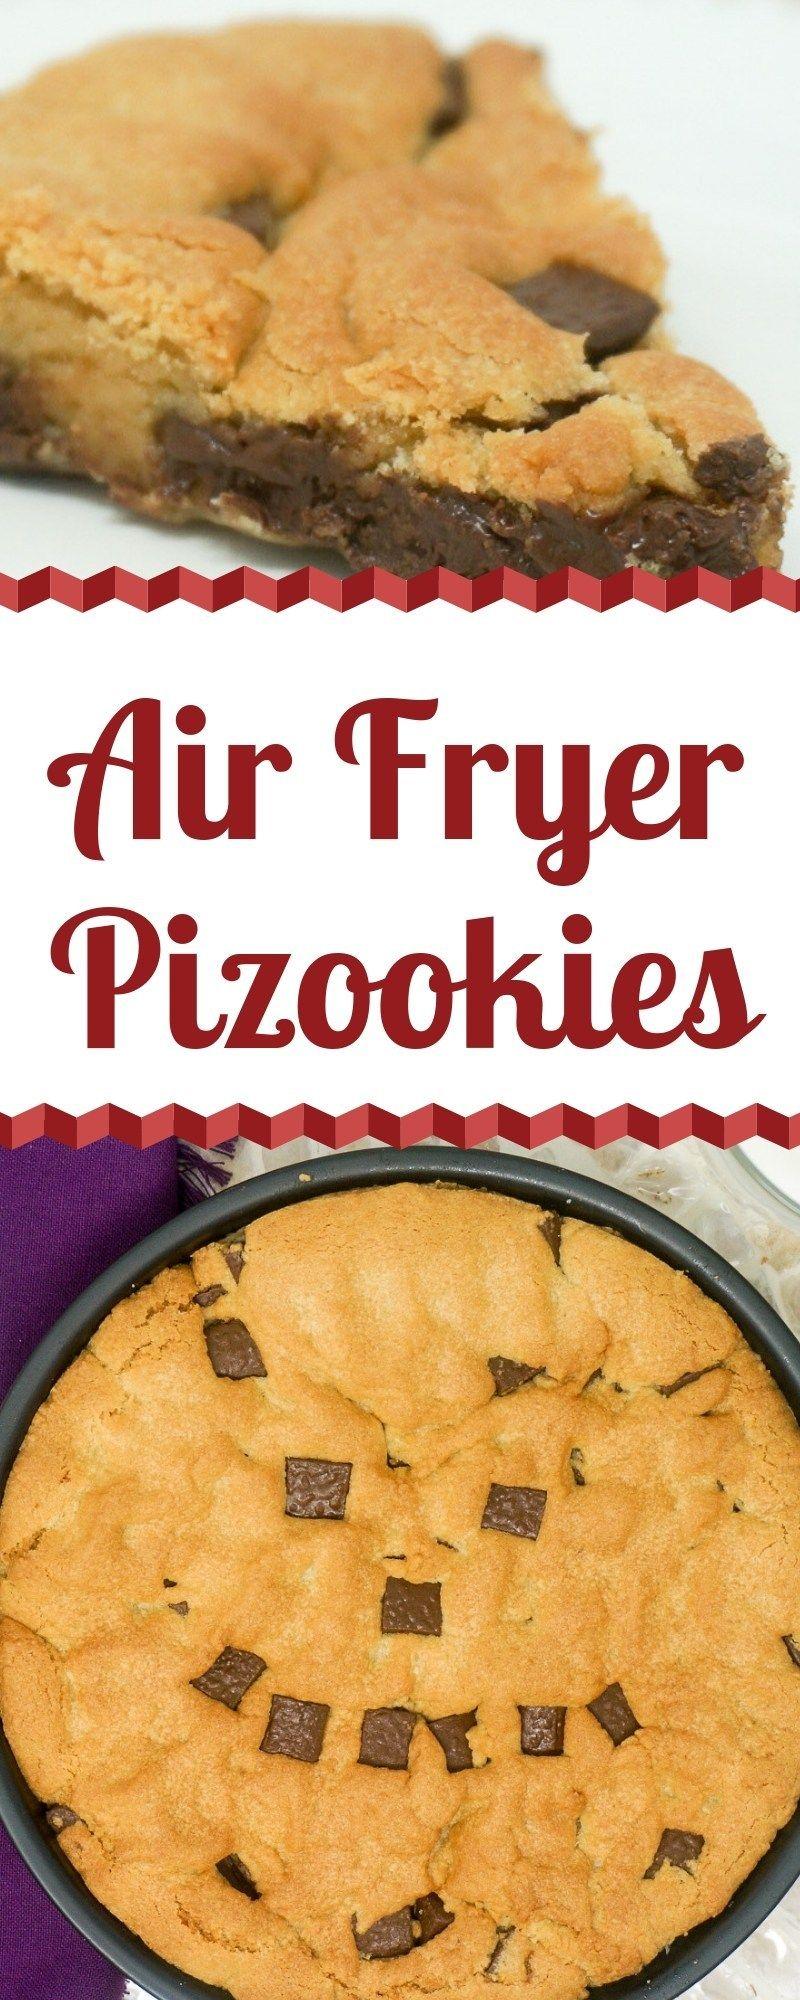 Air Fryer Chocolate Chip Cookie | Grace Like Rain Blog #airfryerrecipes